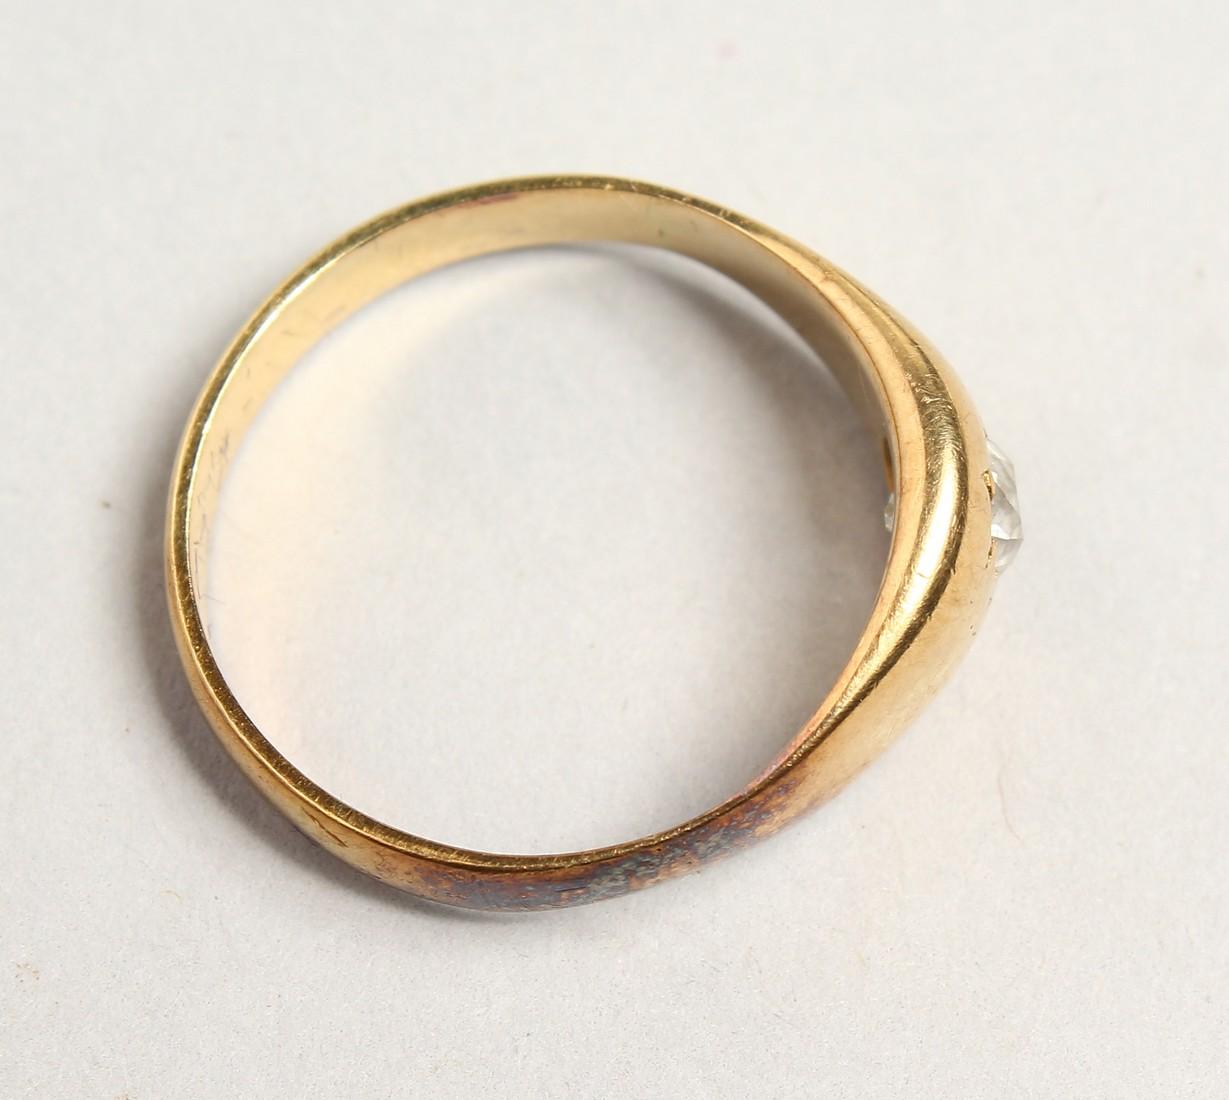 AN 18CT GOLD DIAMOND SET RING. - Image 4 of 4